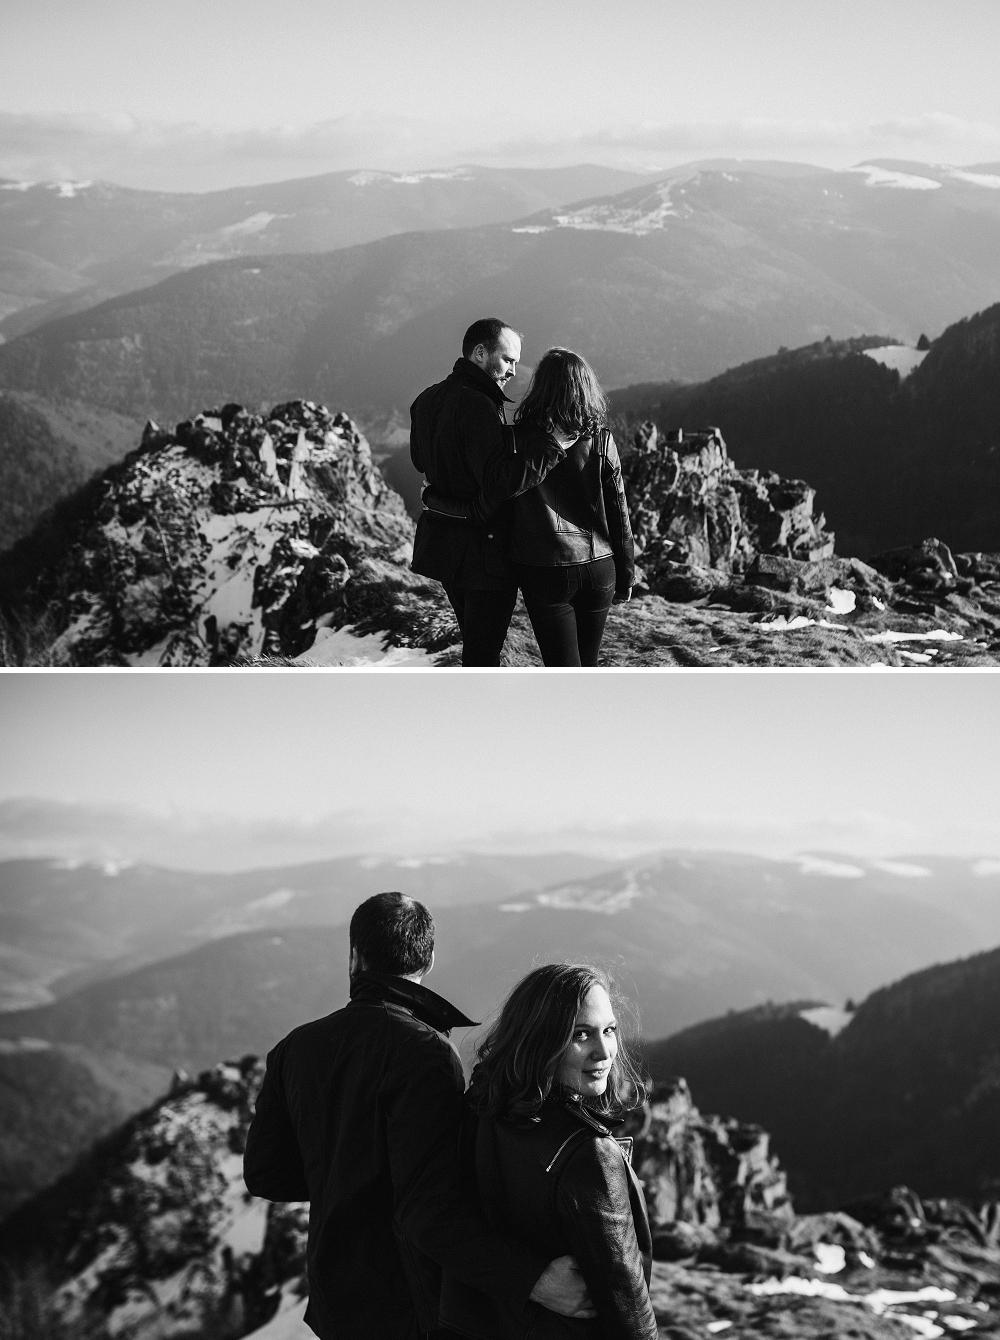 seance-engagement-alsace-montagne-15.jpg